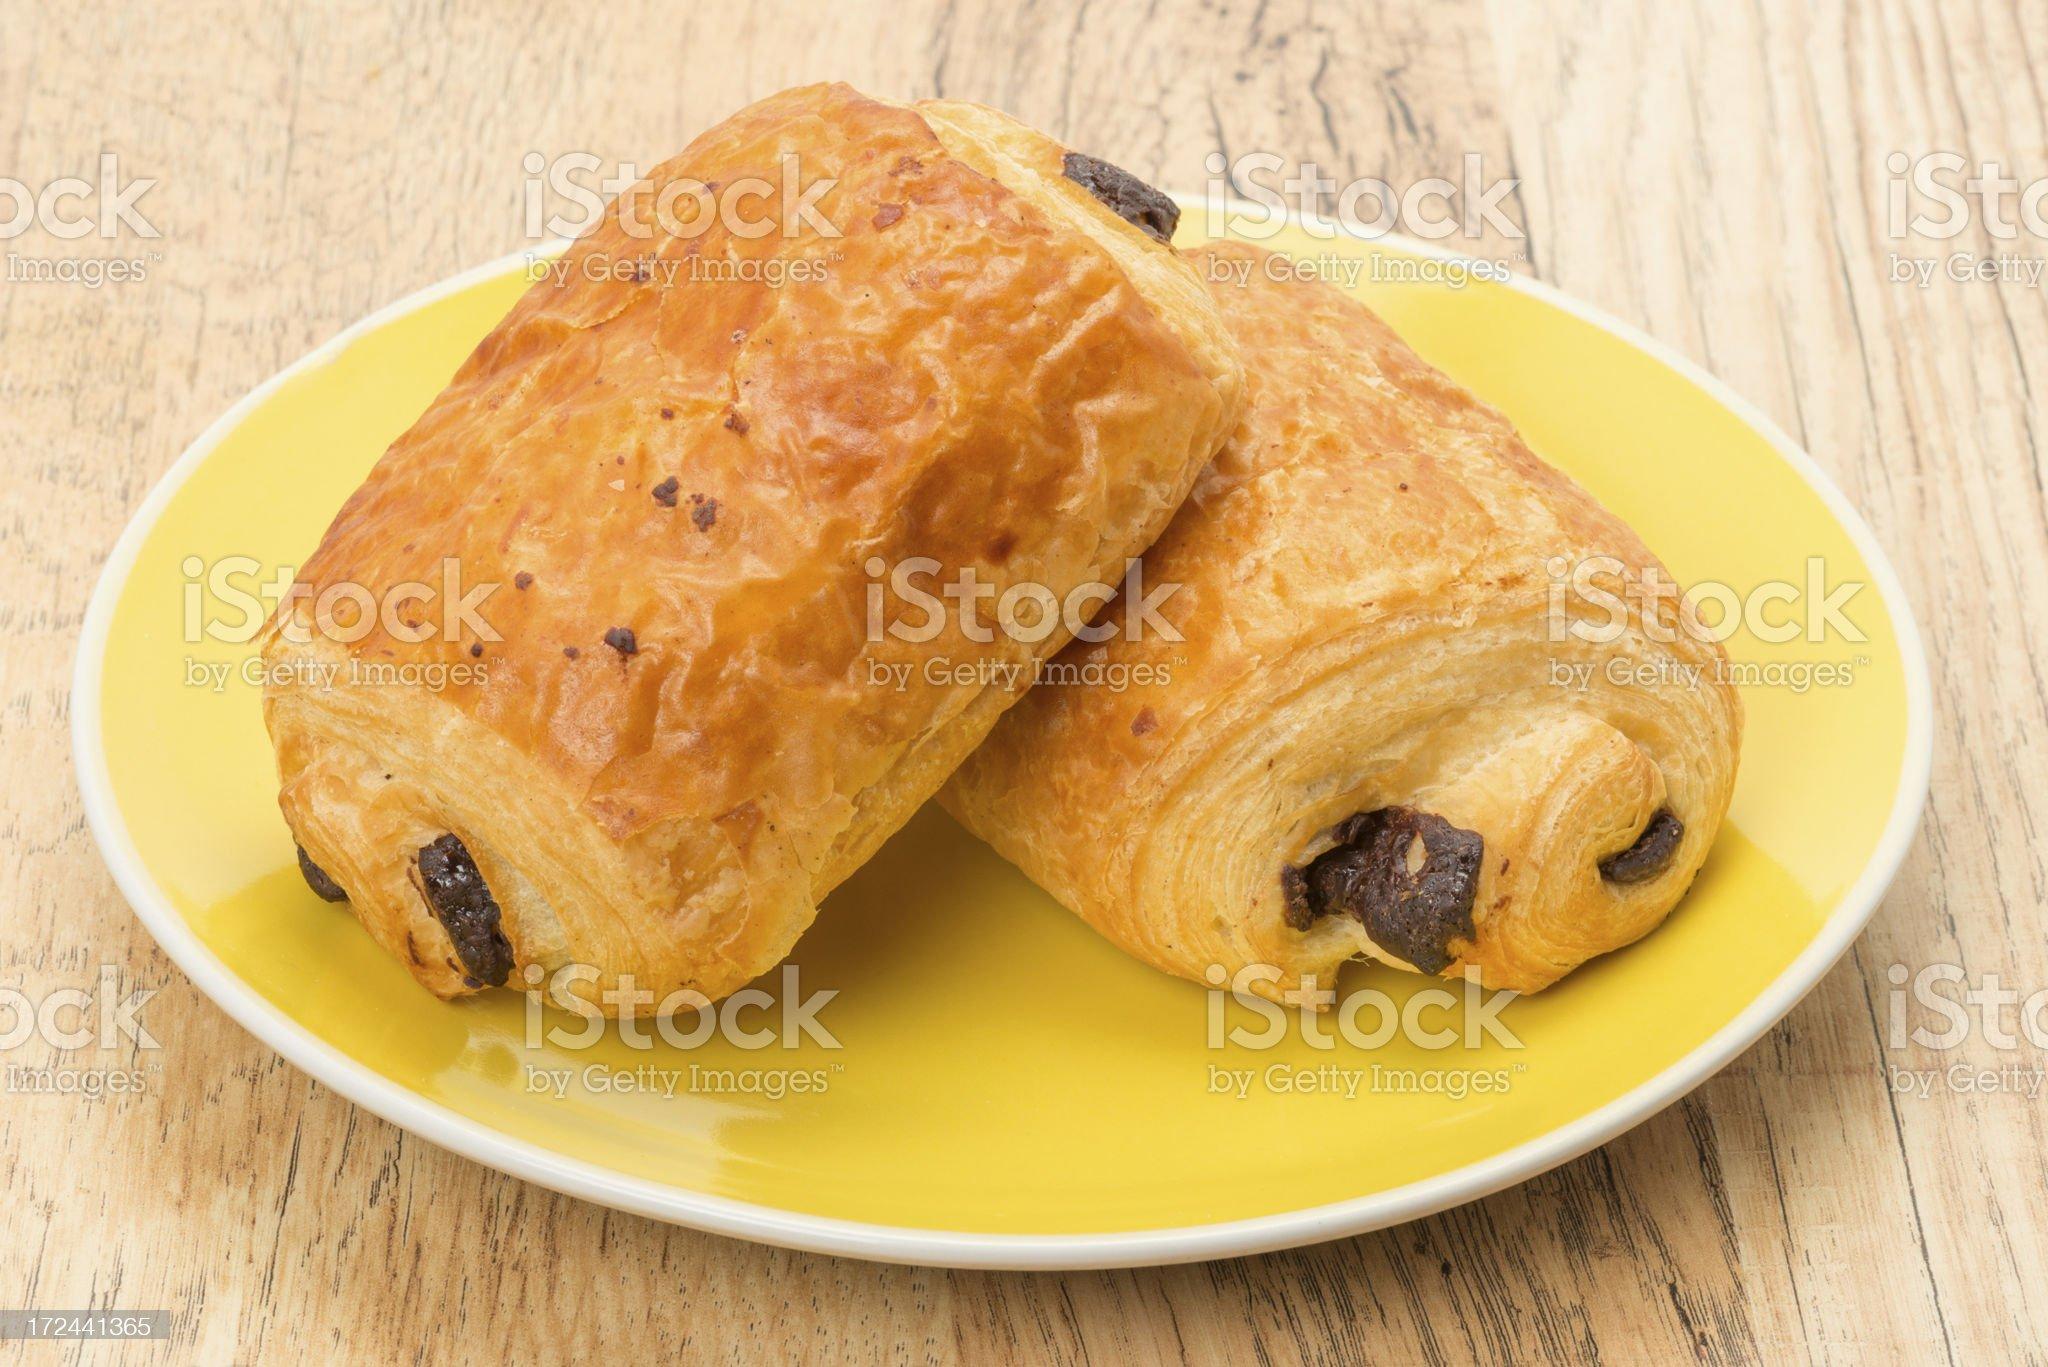 Pain au chocolat pastries royalty-free stock photo